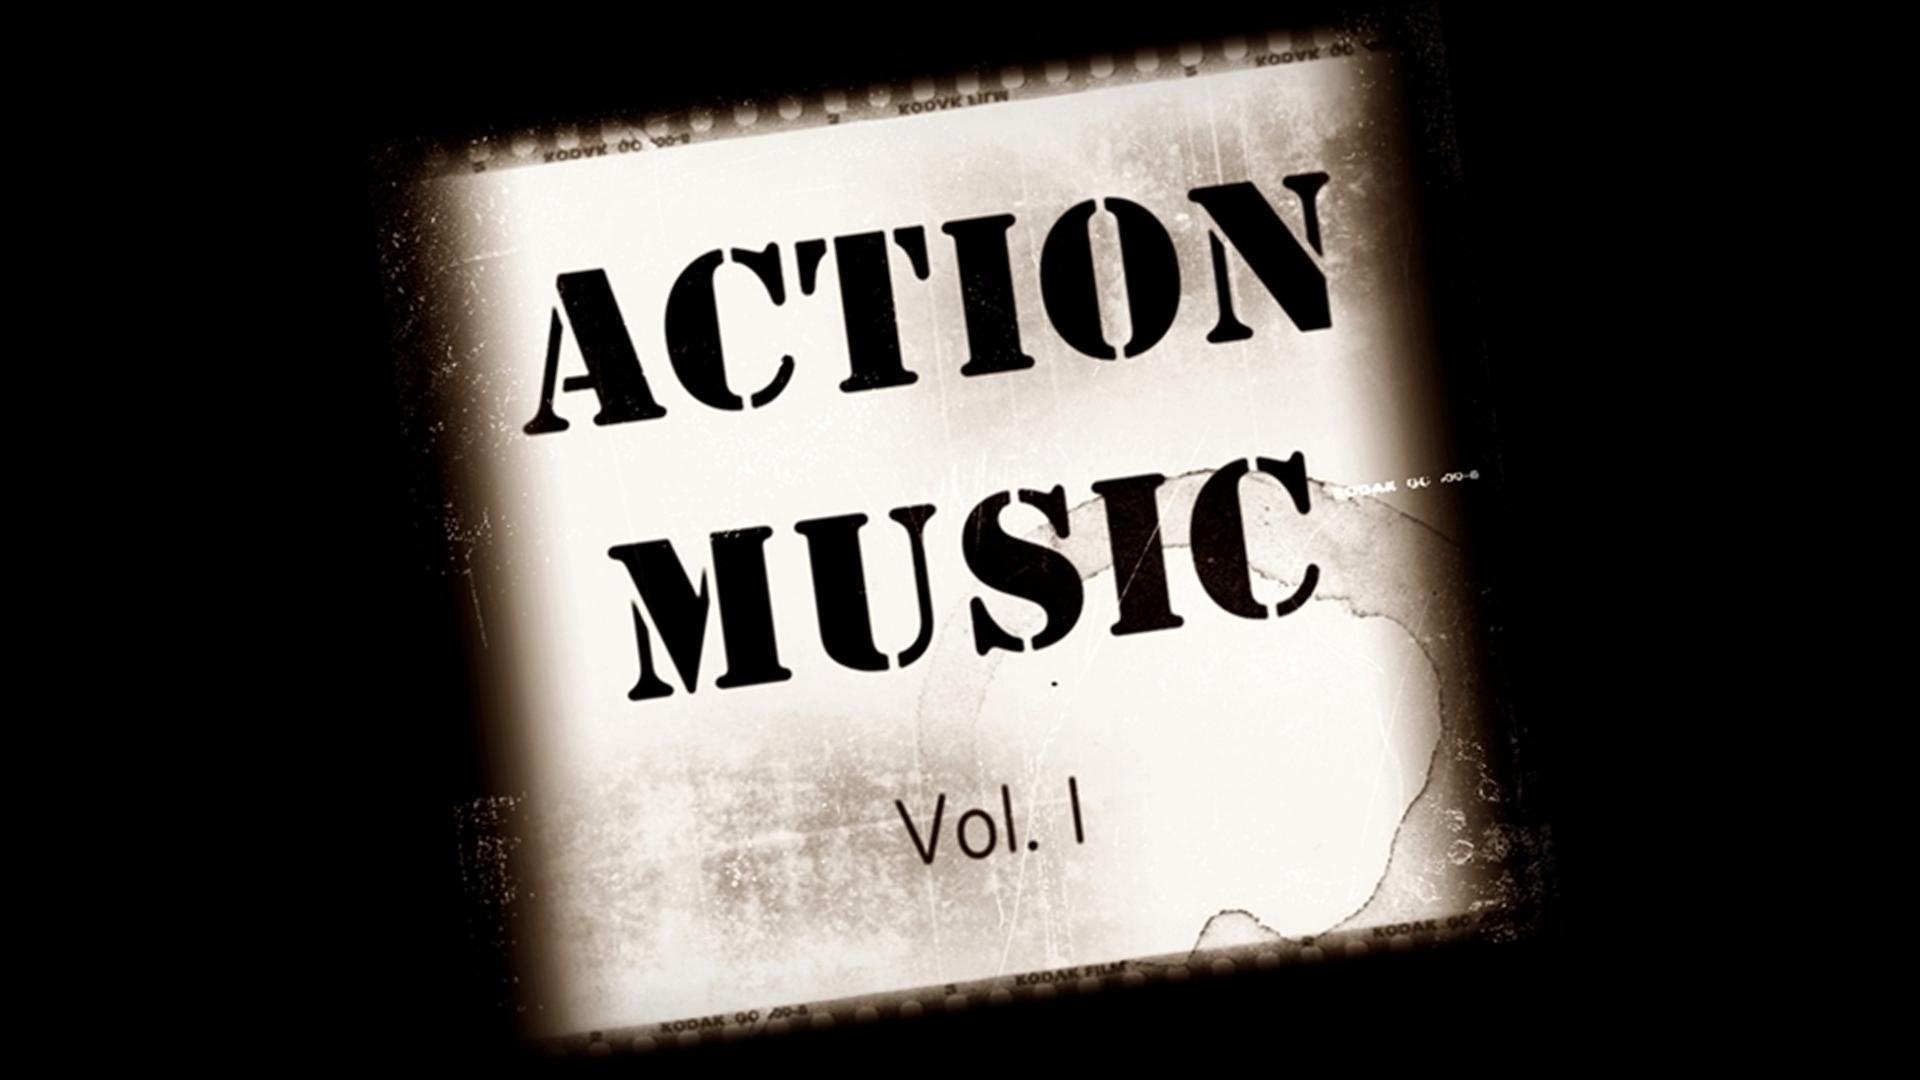 Action Music Vol 1 (Tiago Dias Ferreira)